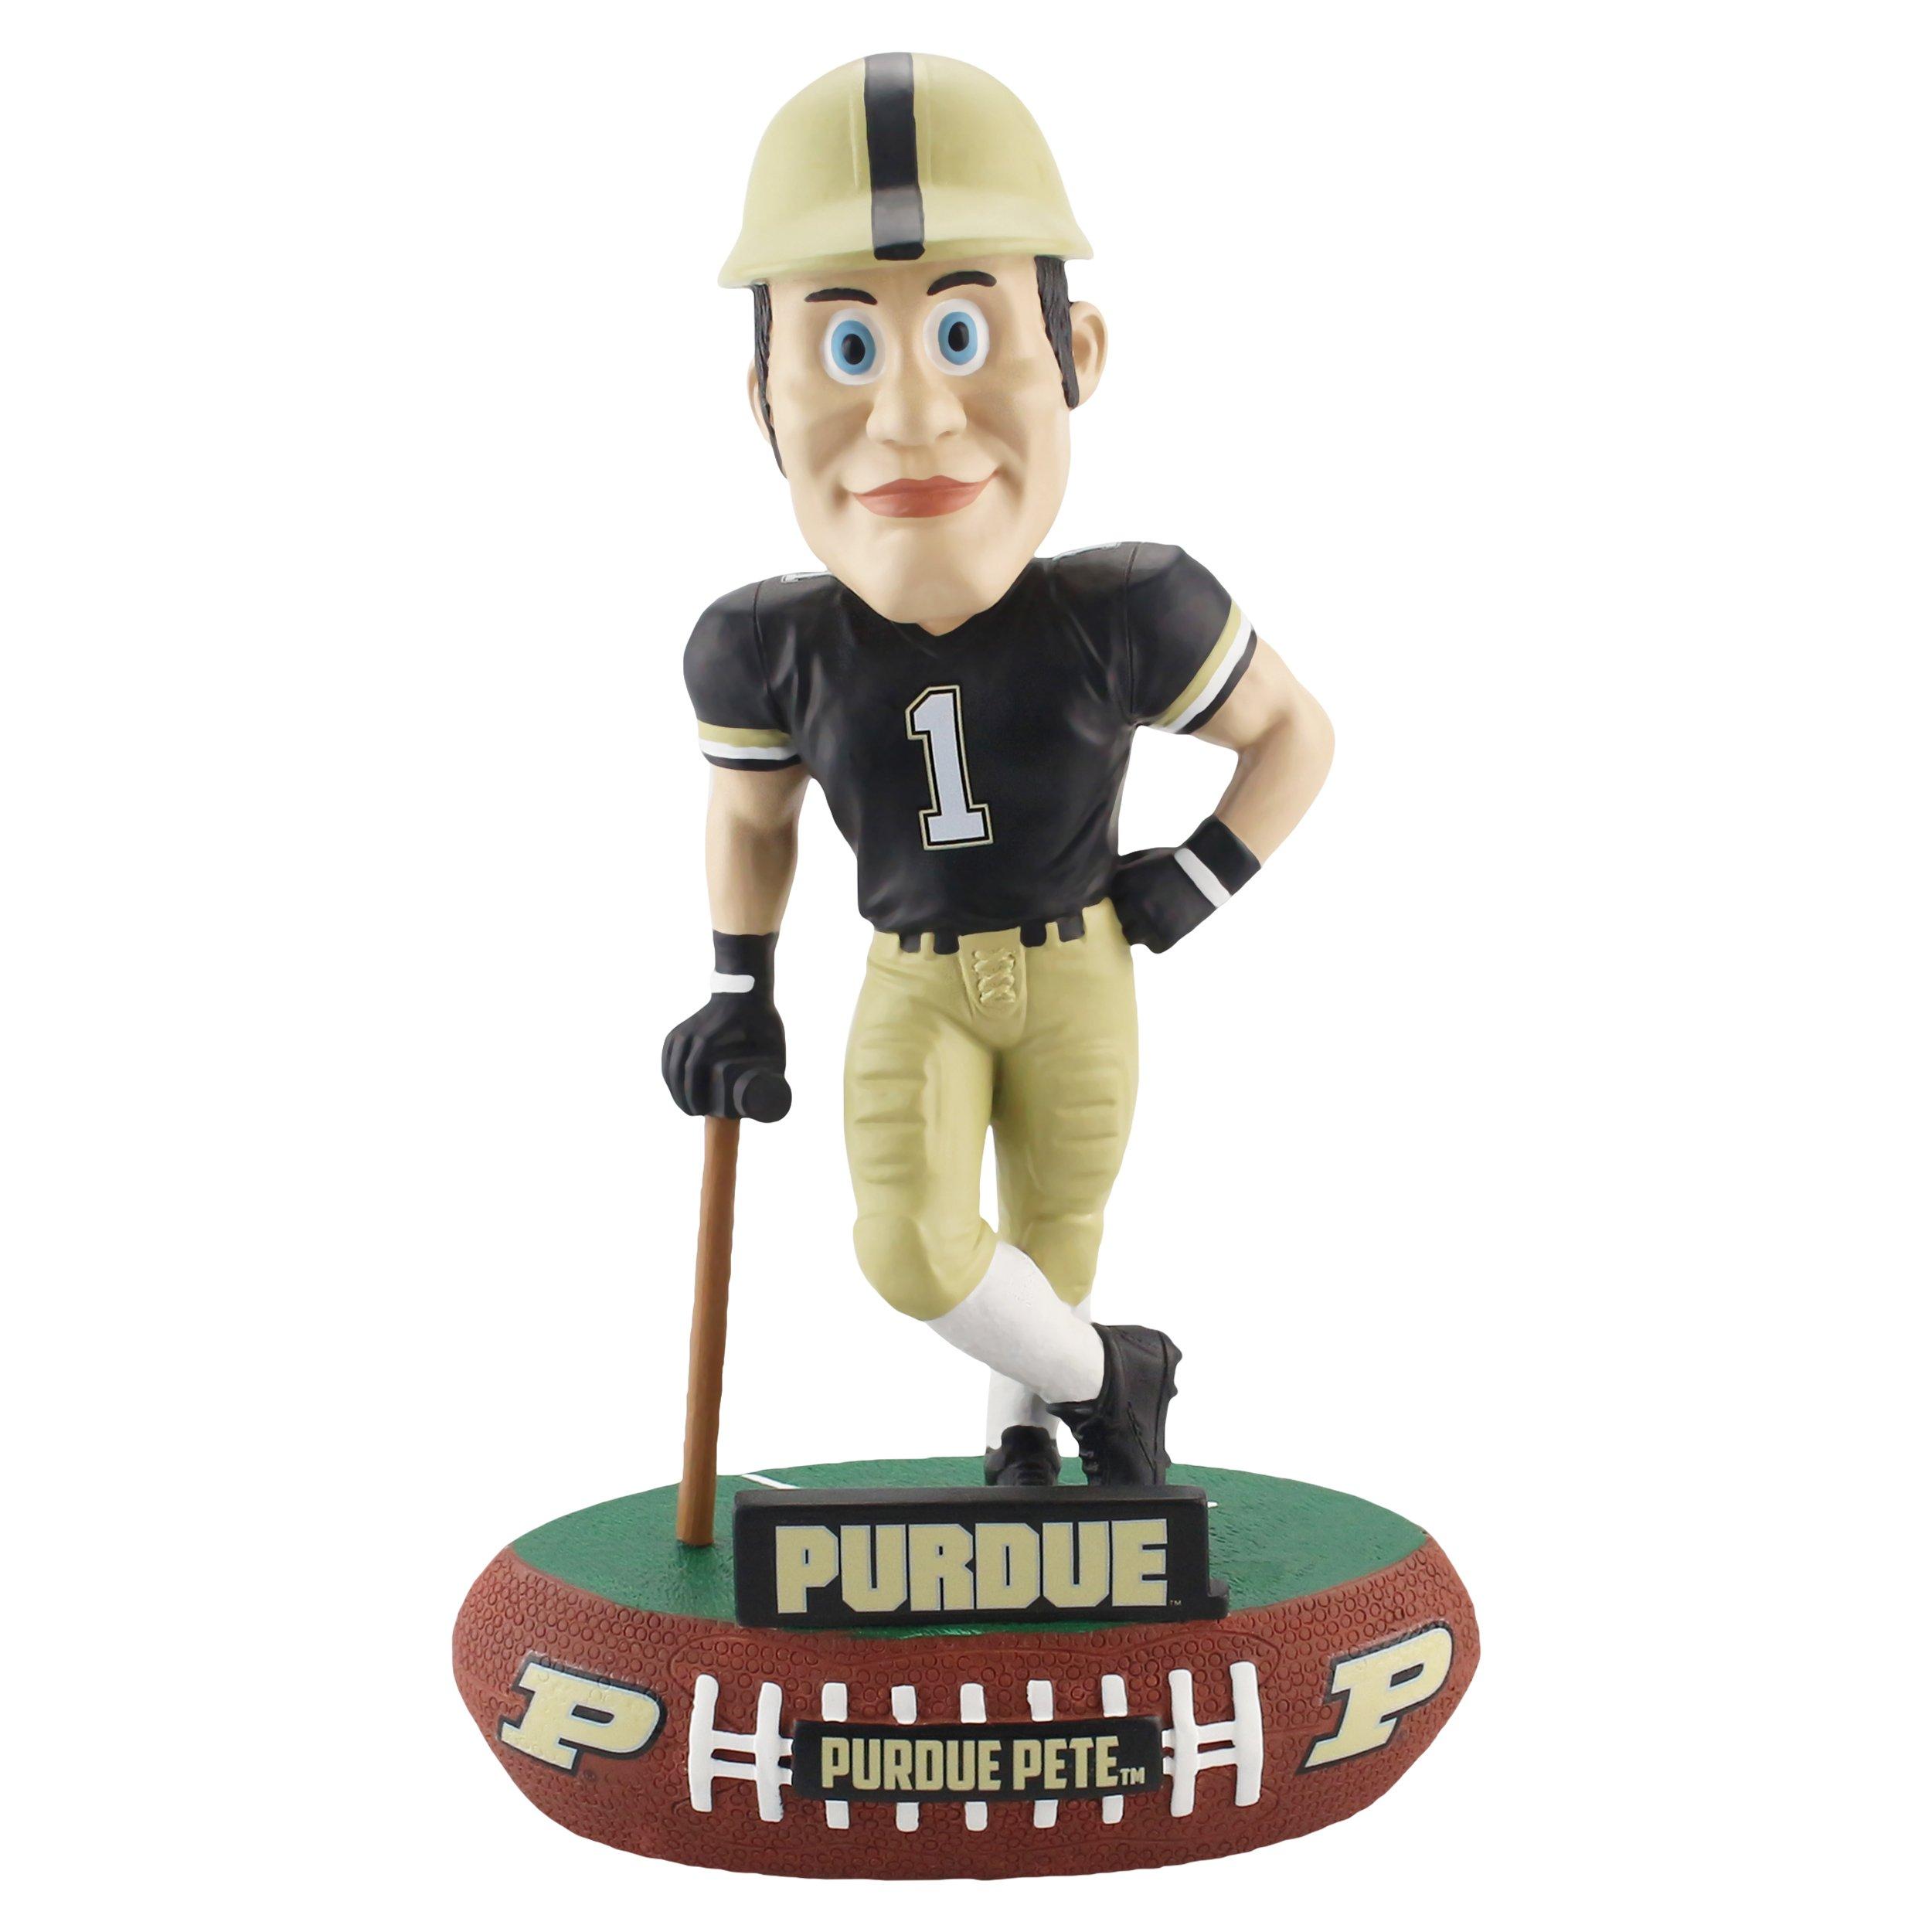 Purdue Boilermakers Mascot Baller Special Edition Bobblehead NCAA